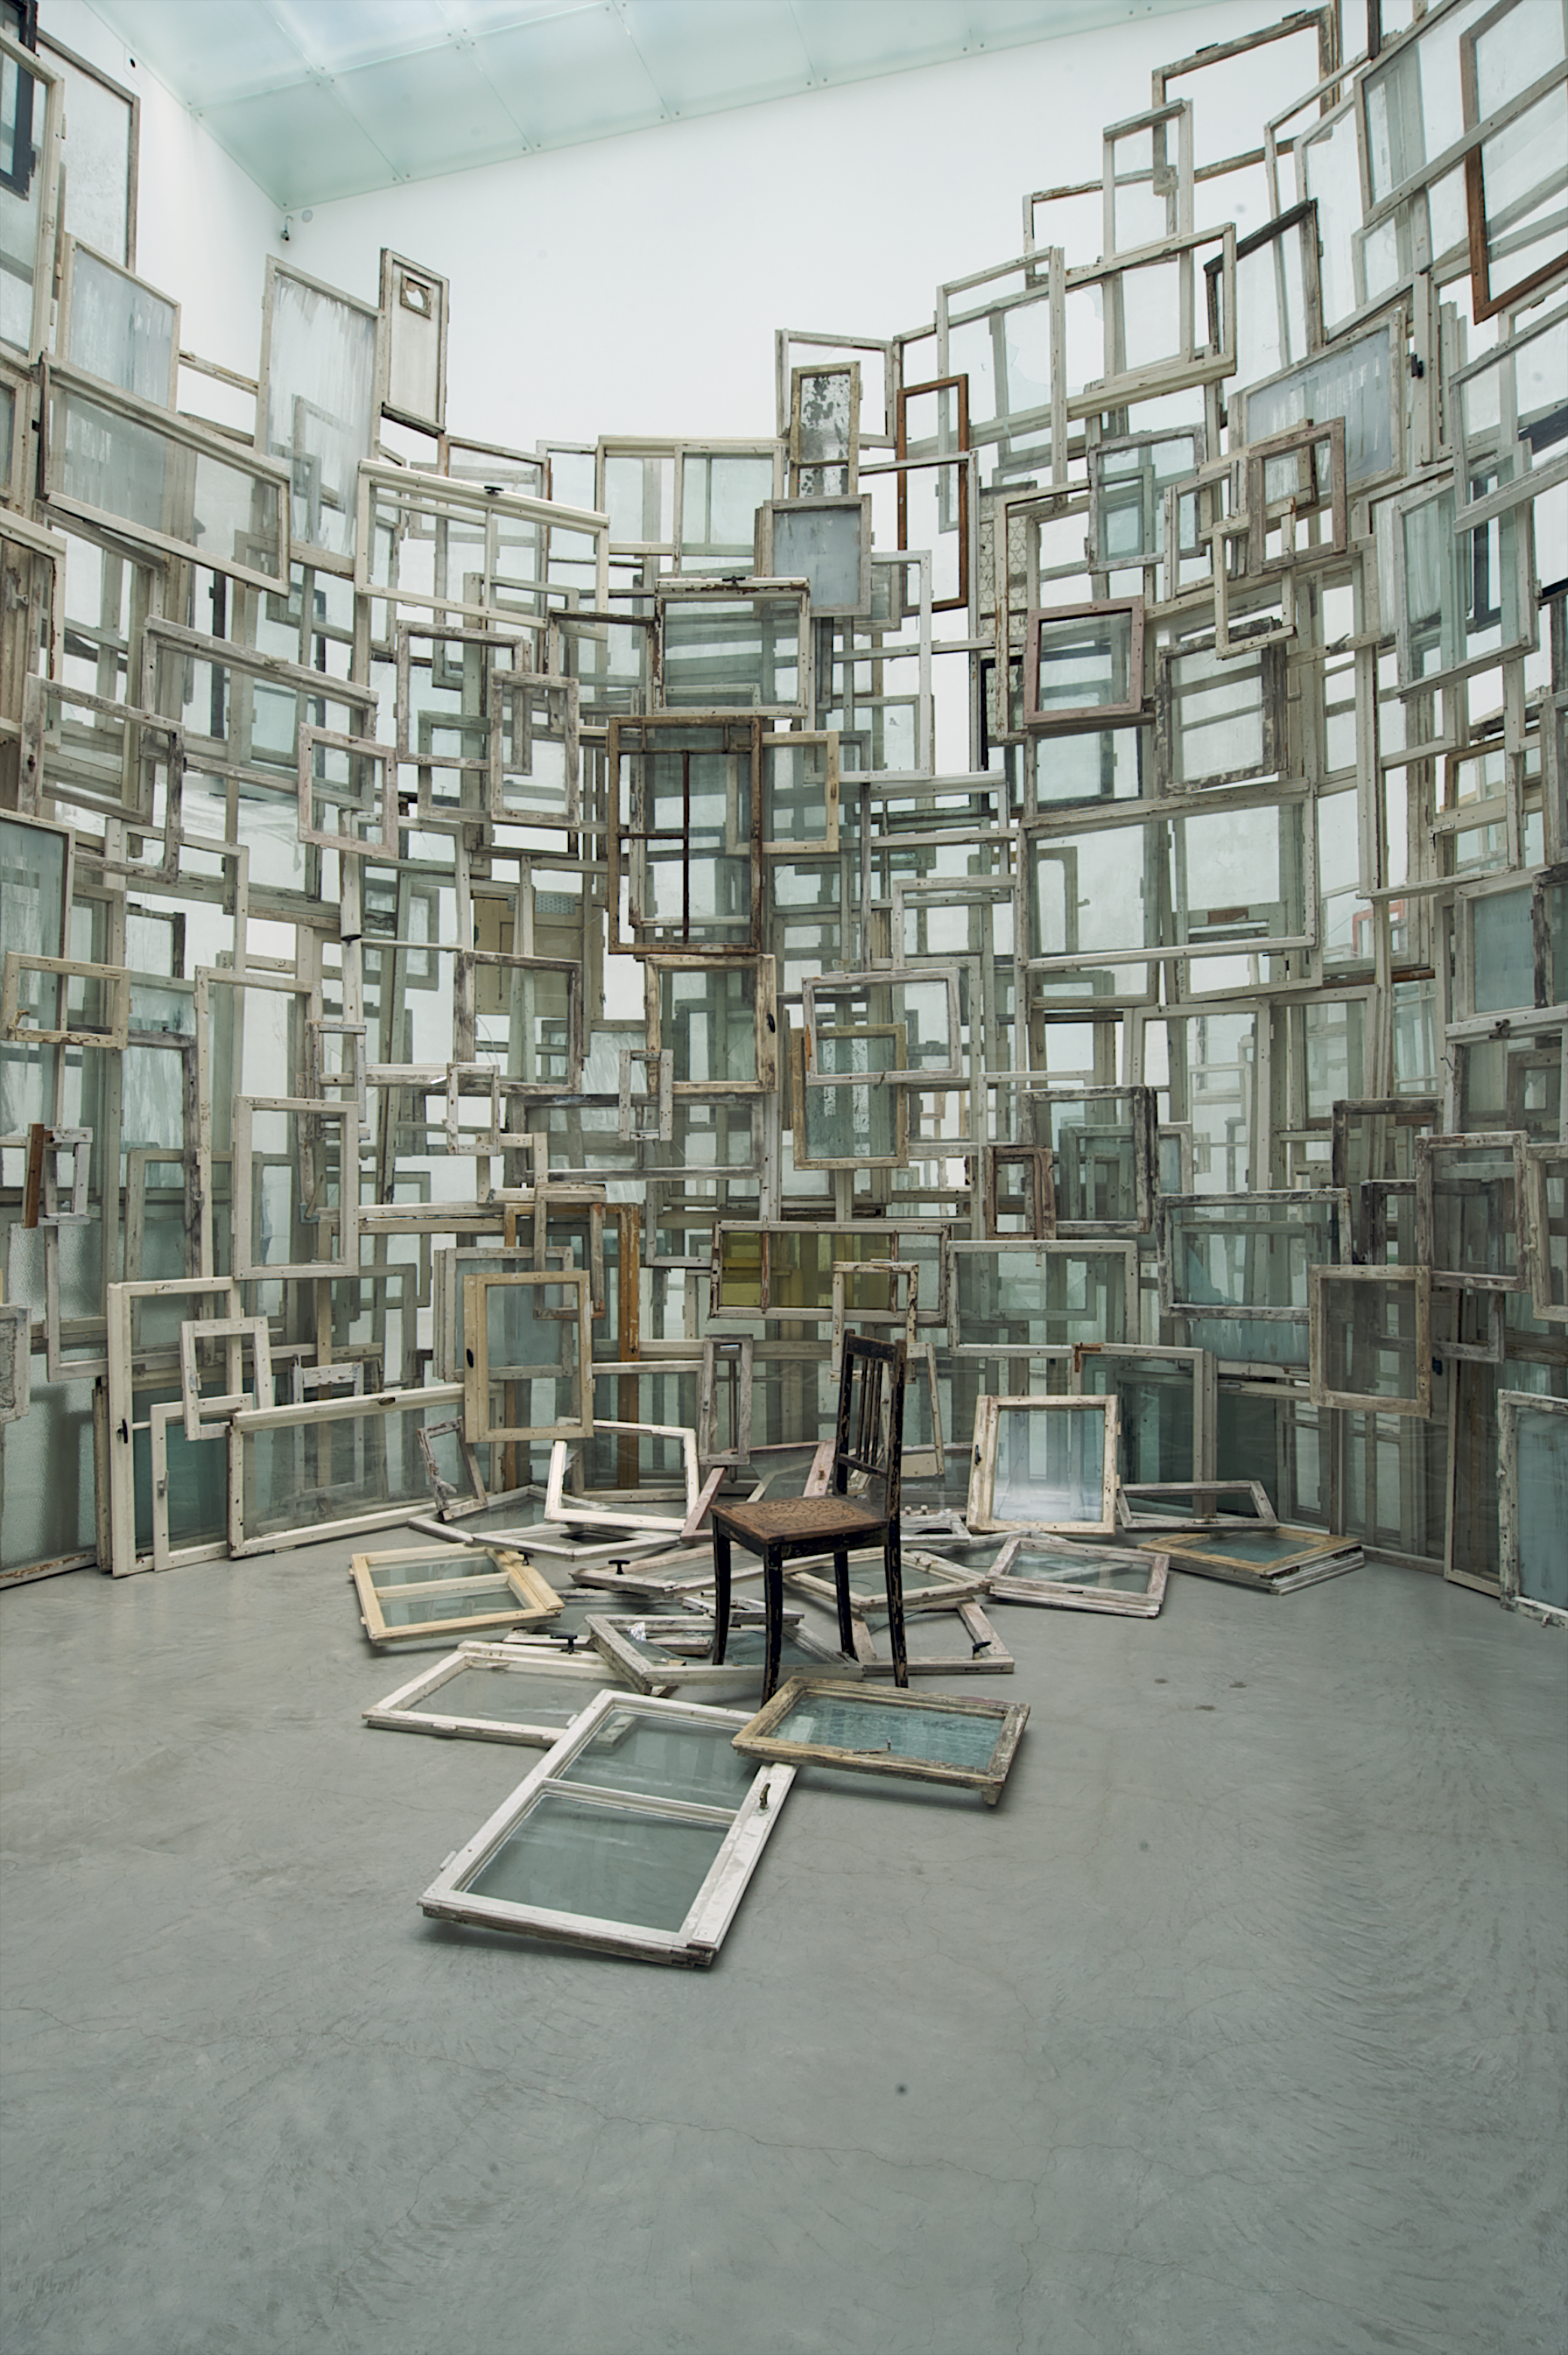 82009_A Room of Memory_Museum of Contemporary Art_Kanazawa_Photo Sunhi Mang_4.jpg